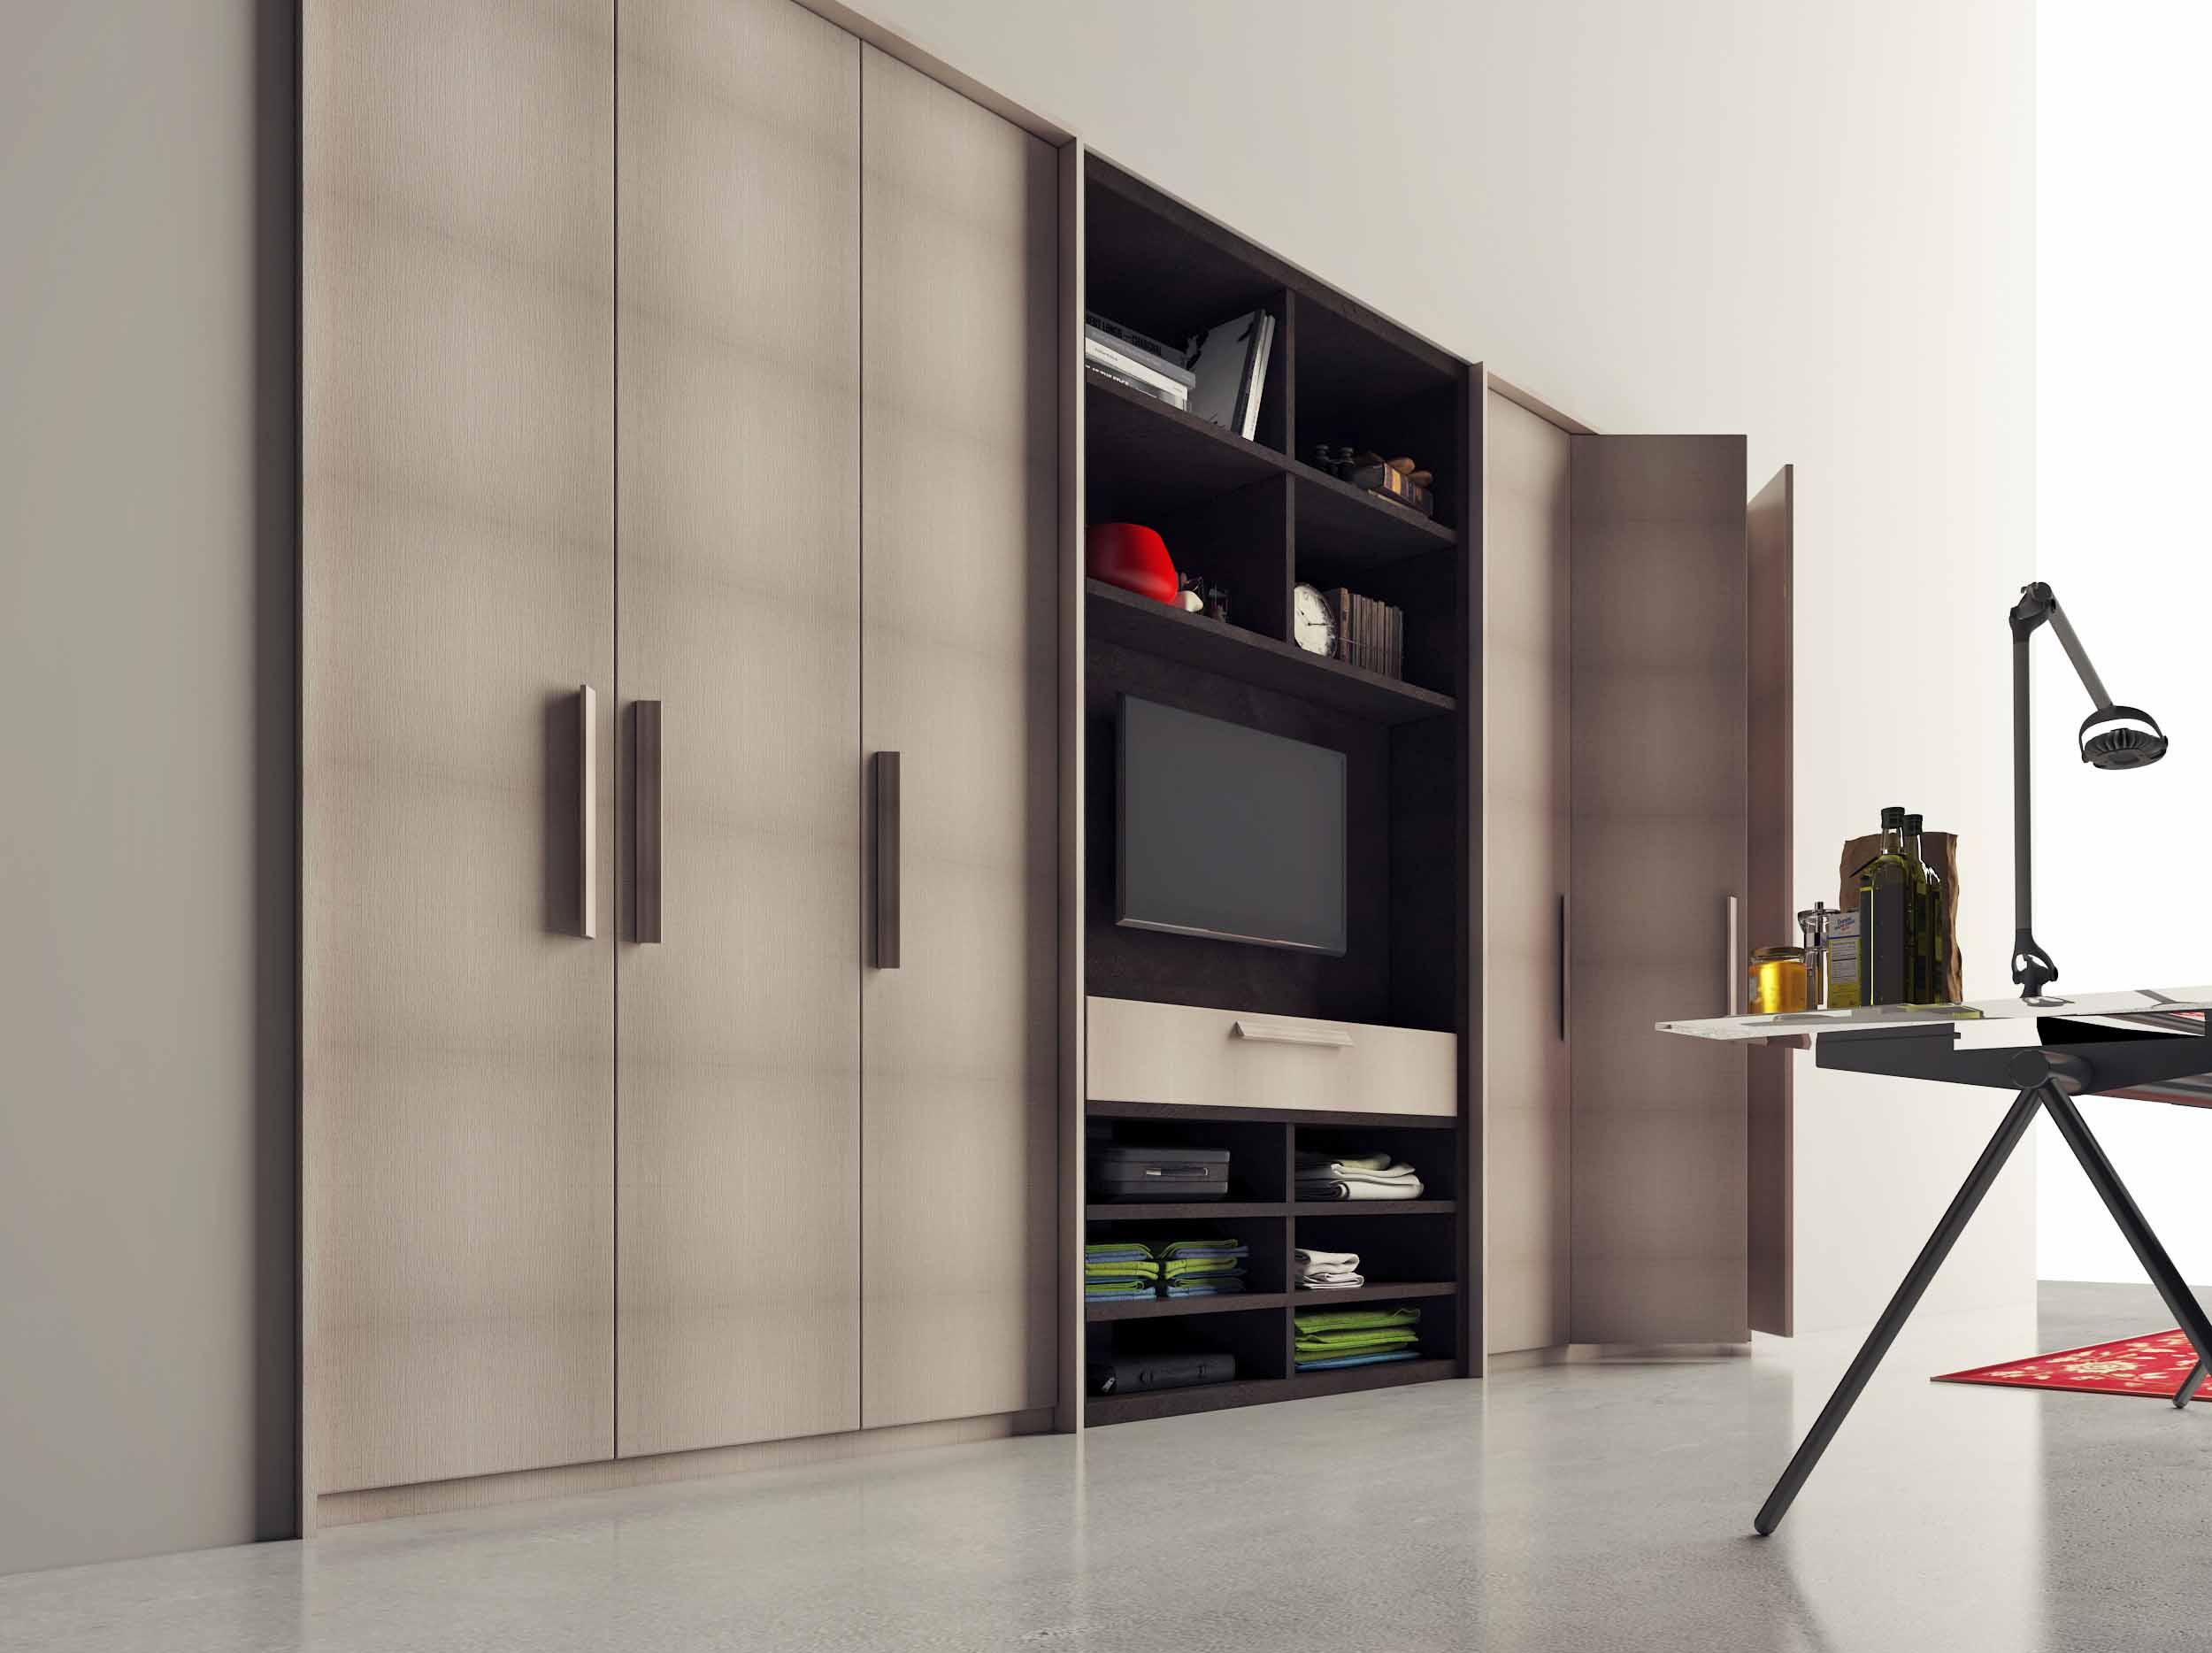 Hinged Wardrobe With Tv Storage Unit in Dark Grey Concrete Finish